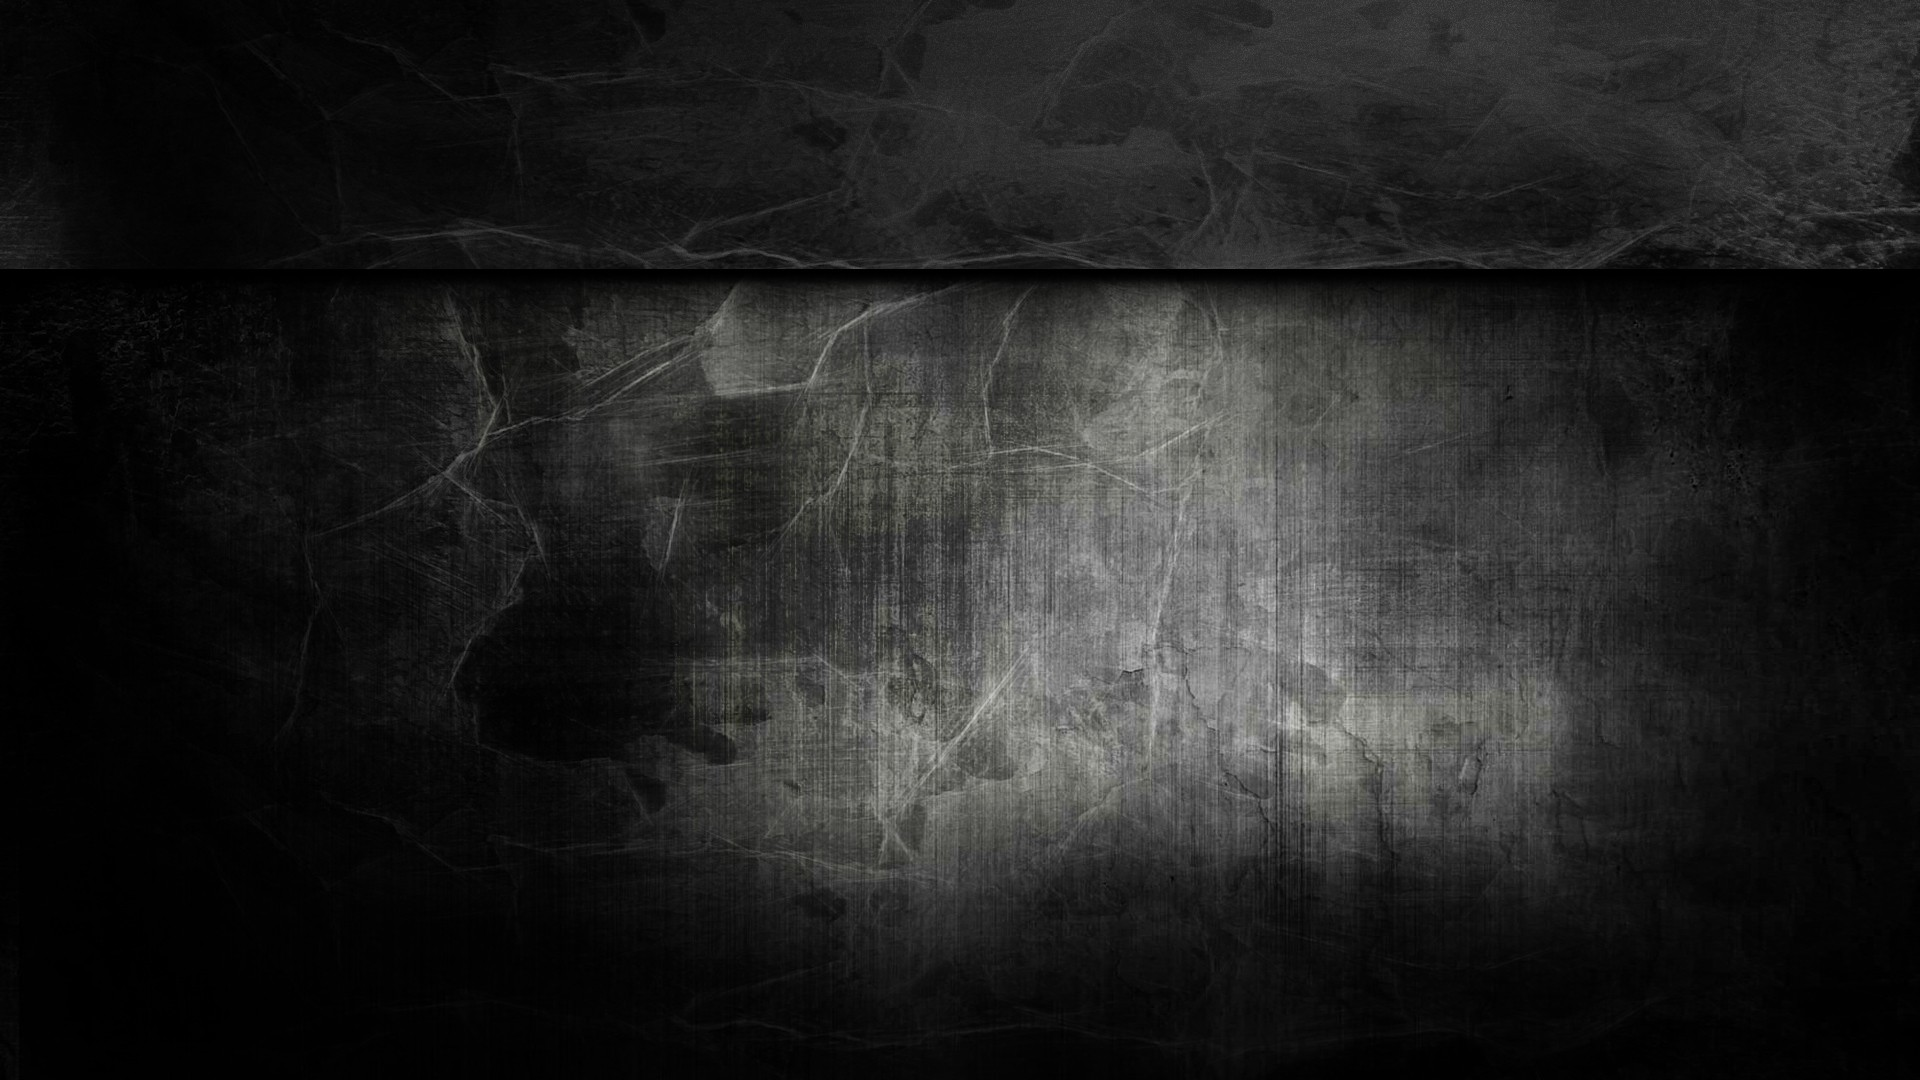 Black Grunge Wallpaper 1920x1080